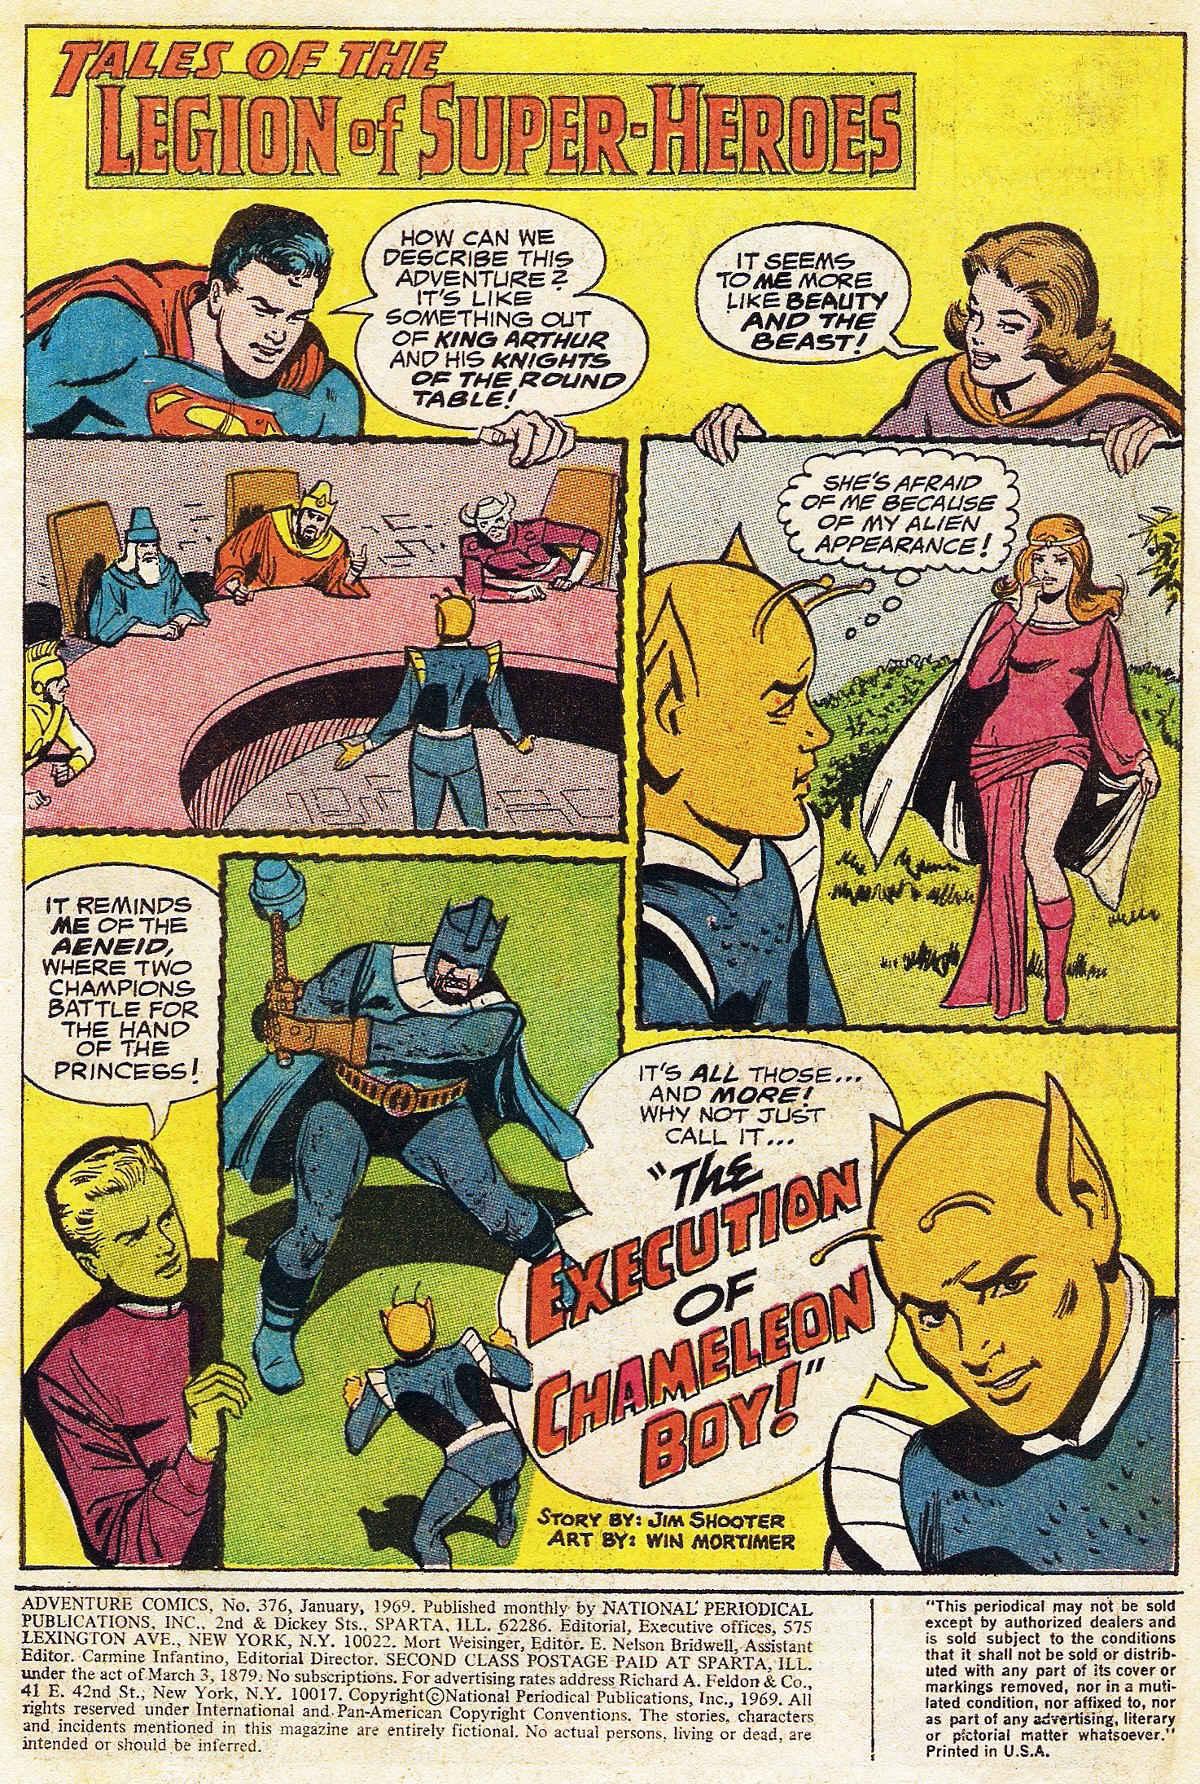 Read online Adventure Comics (1938) comic -  Issue #376 - 3